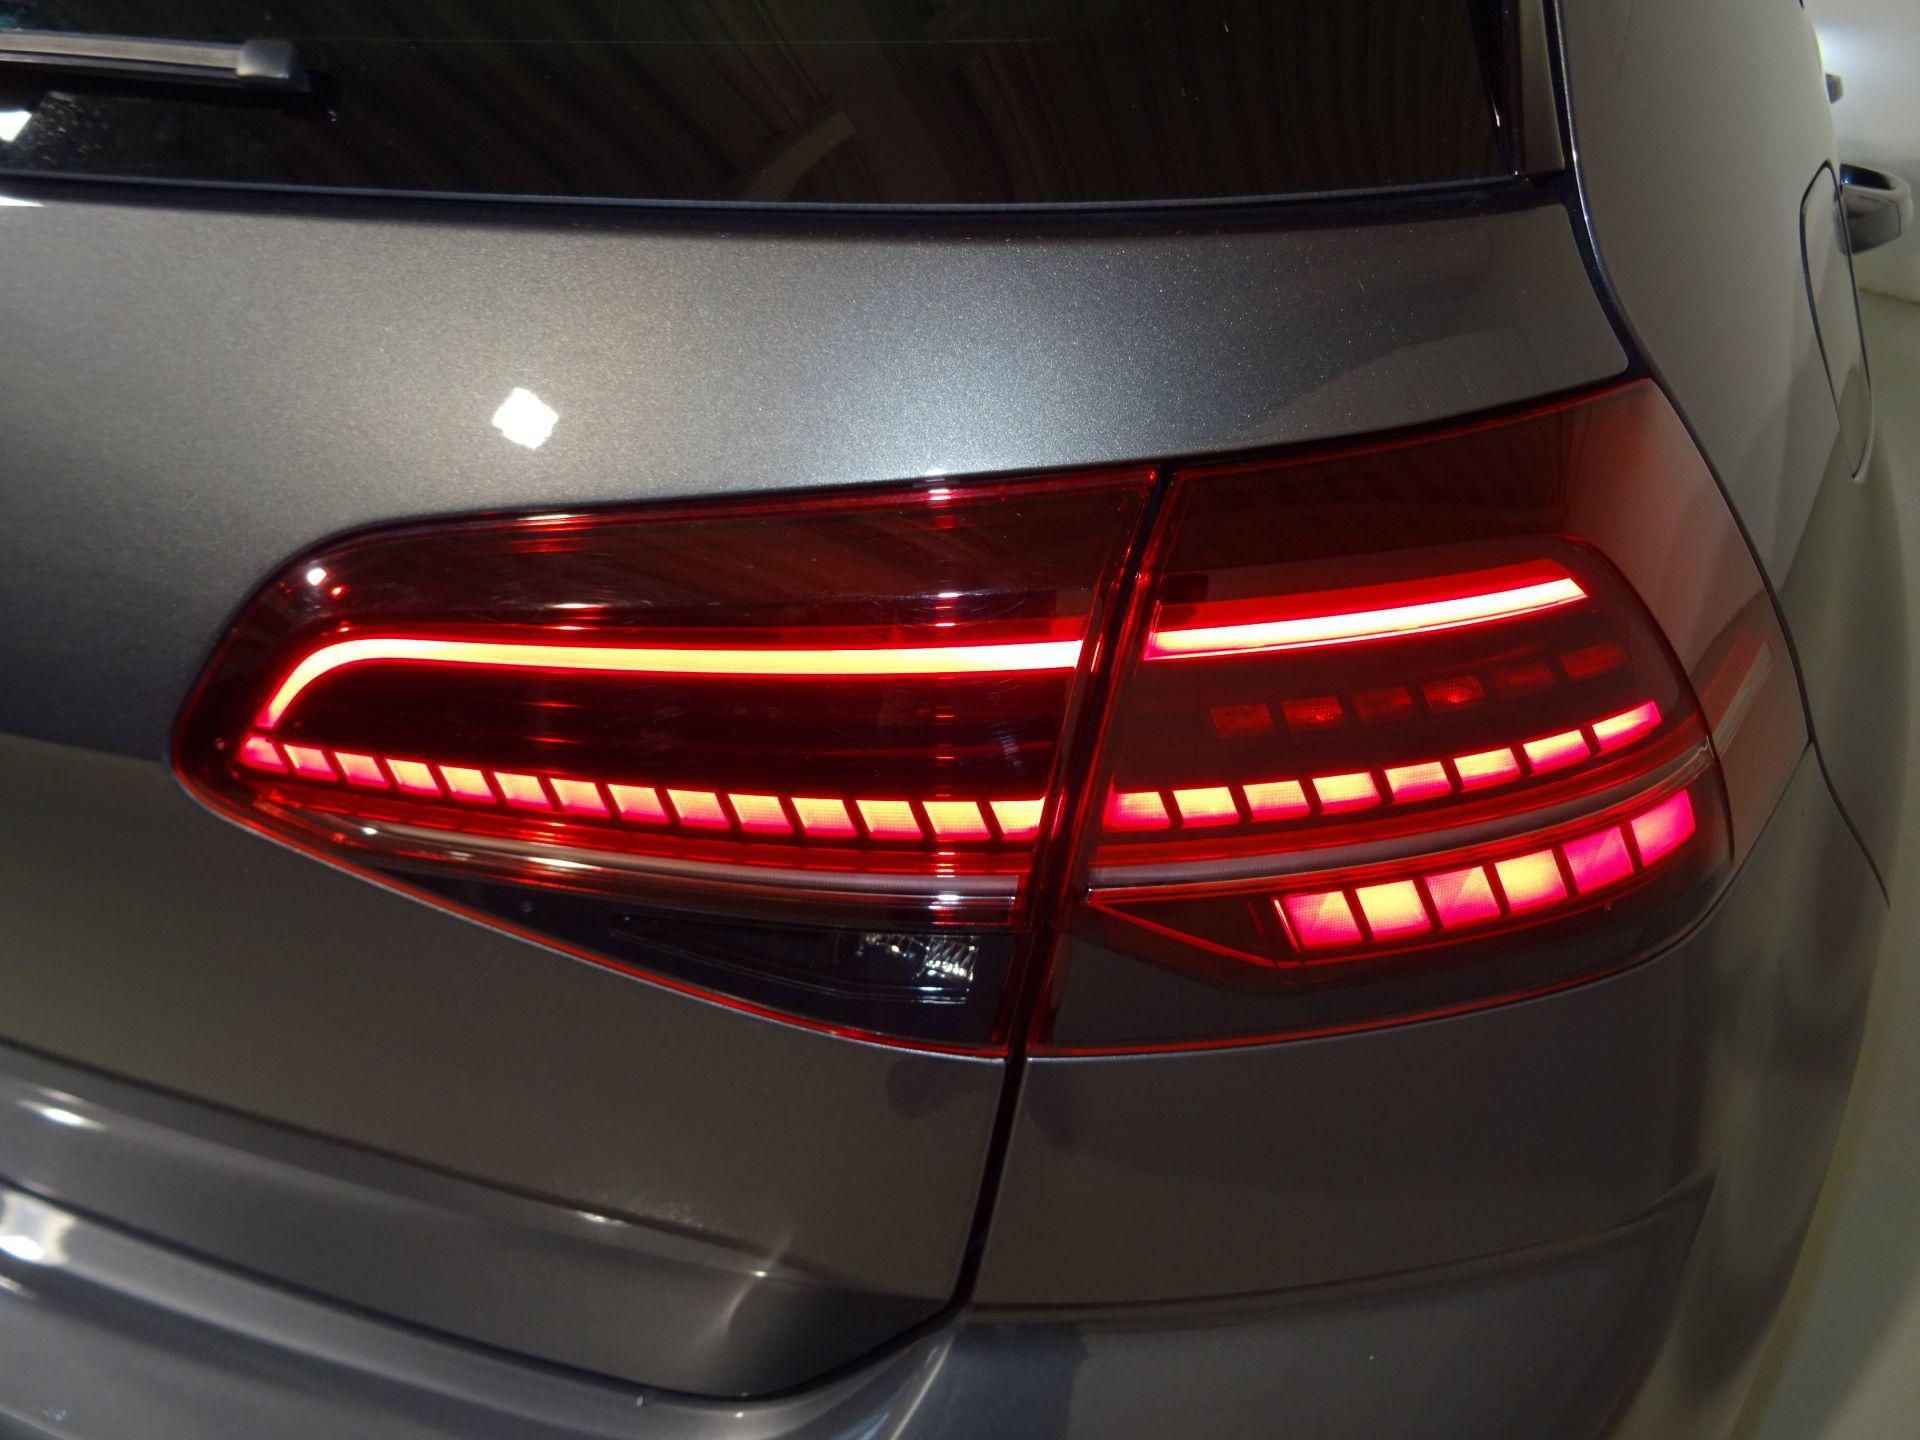 Volkswagen Golf R 2.0 TSI 221kW (300CV) 4Motion DSG